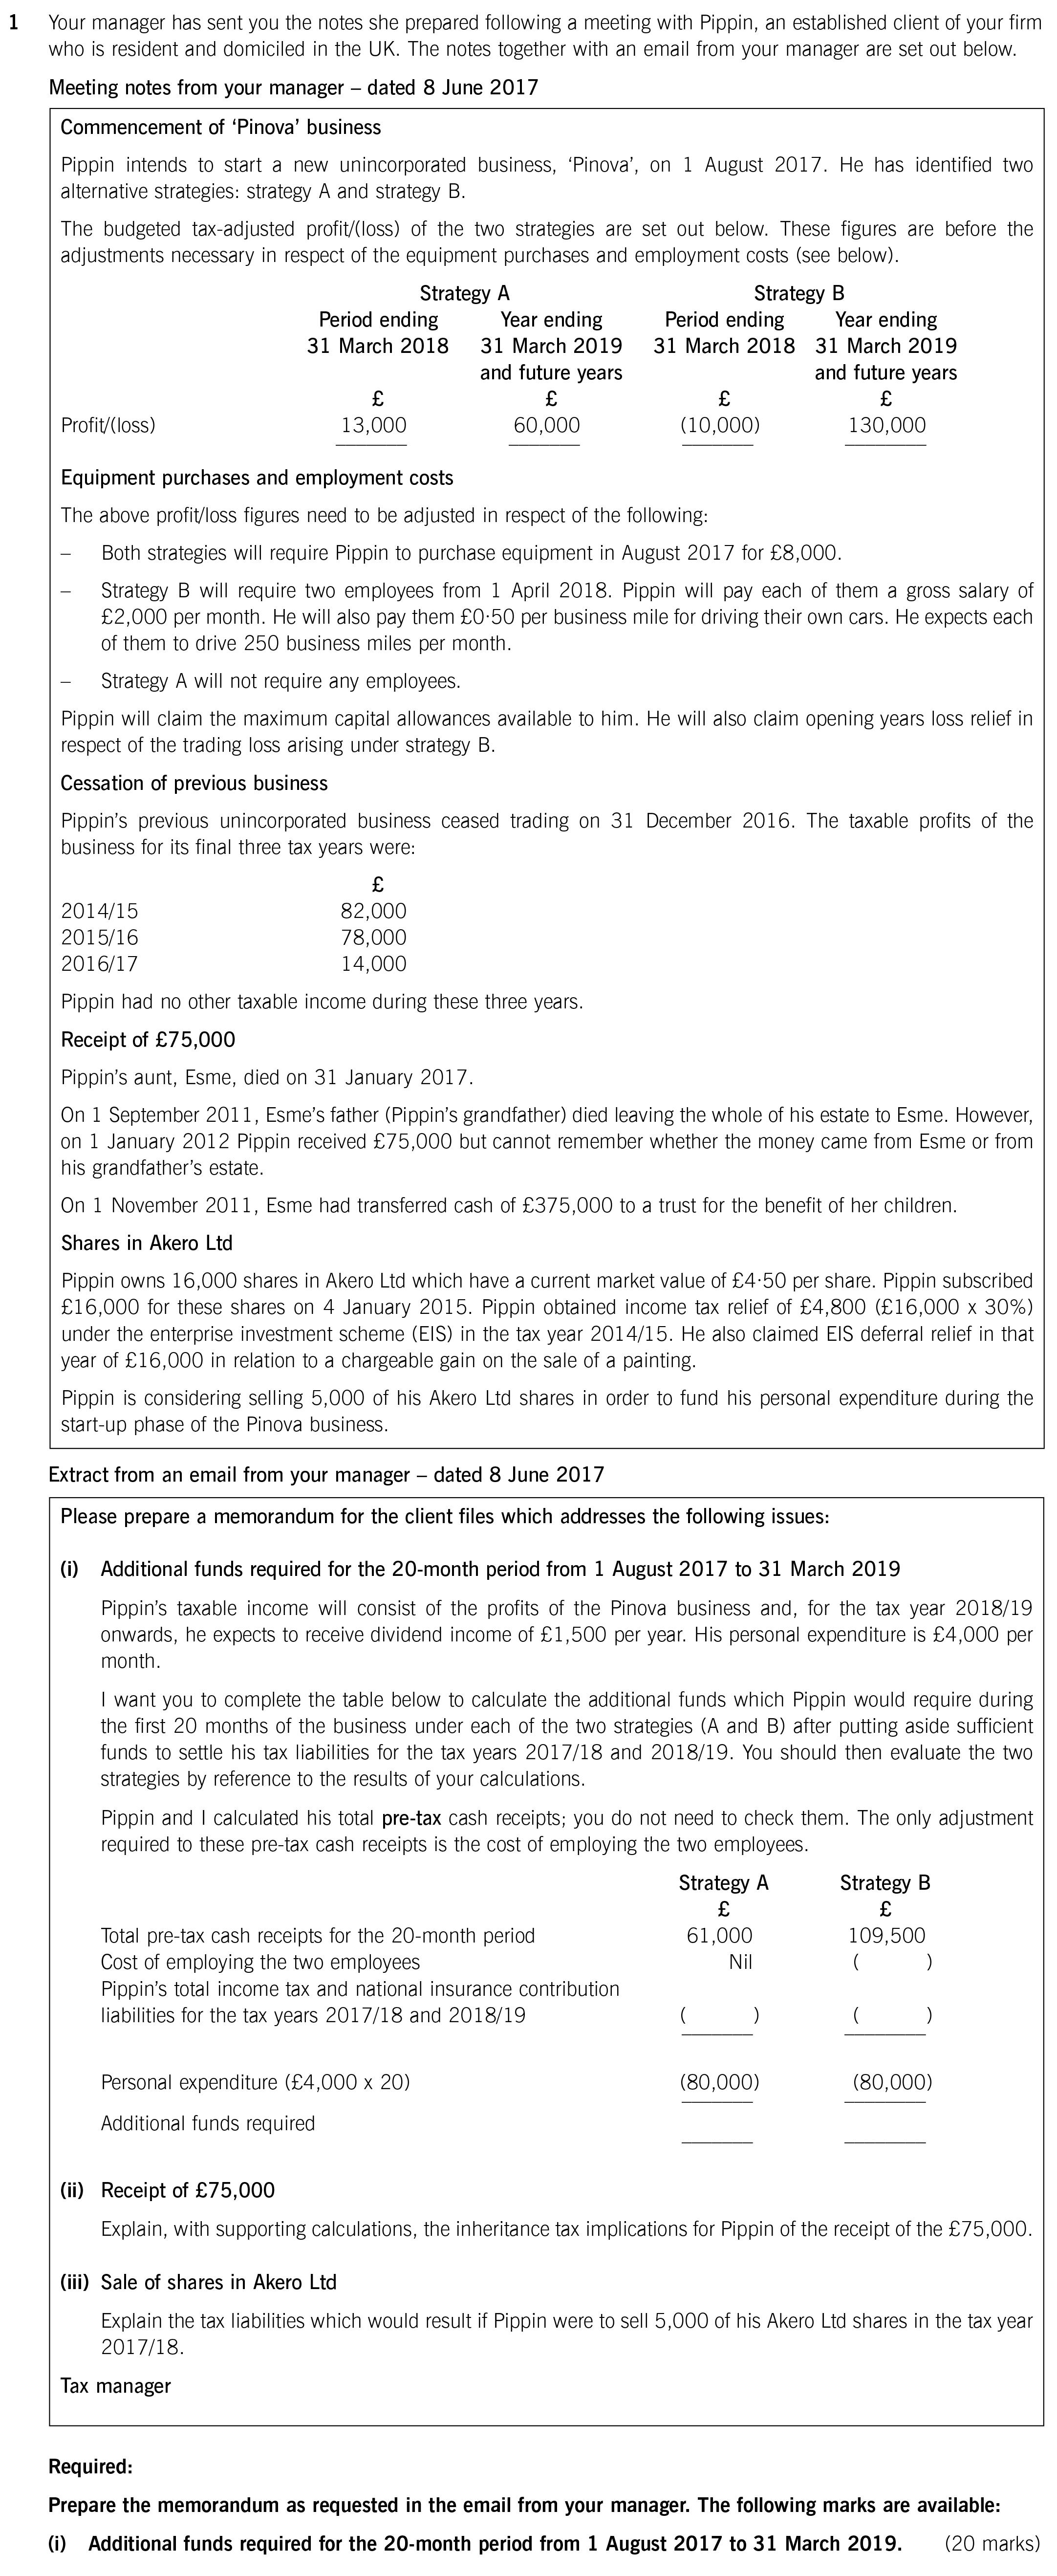 ACCA ATX P6 UK Past papers exam Q1i